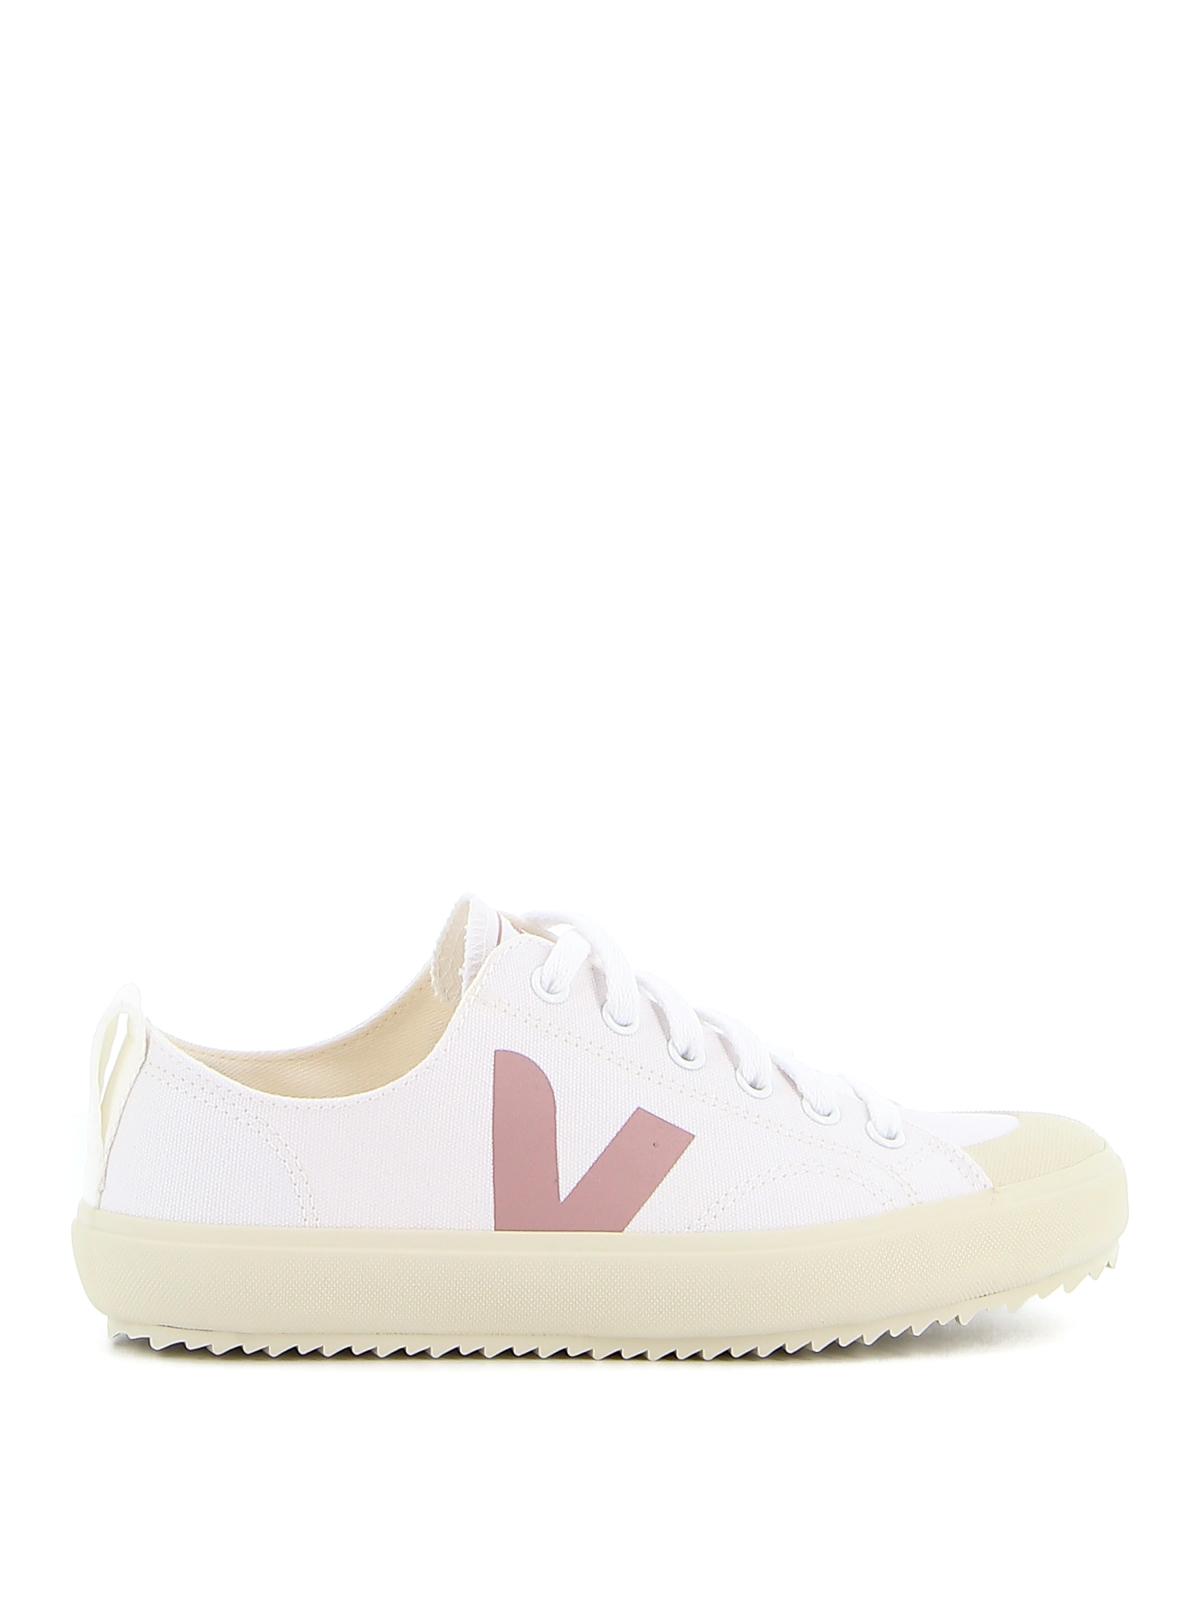 Veja Sneakers NOVA COTTON SNEAKERS